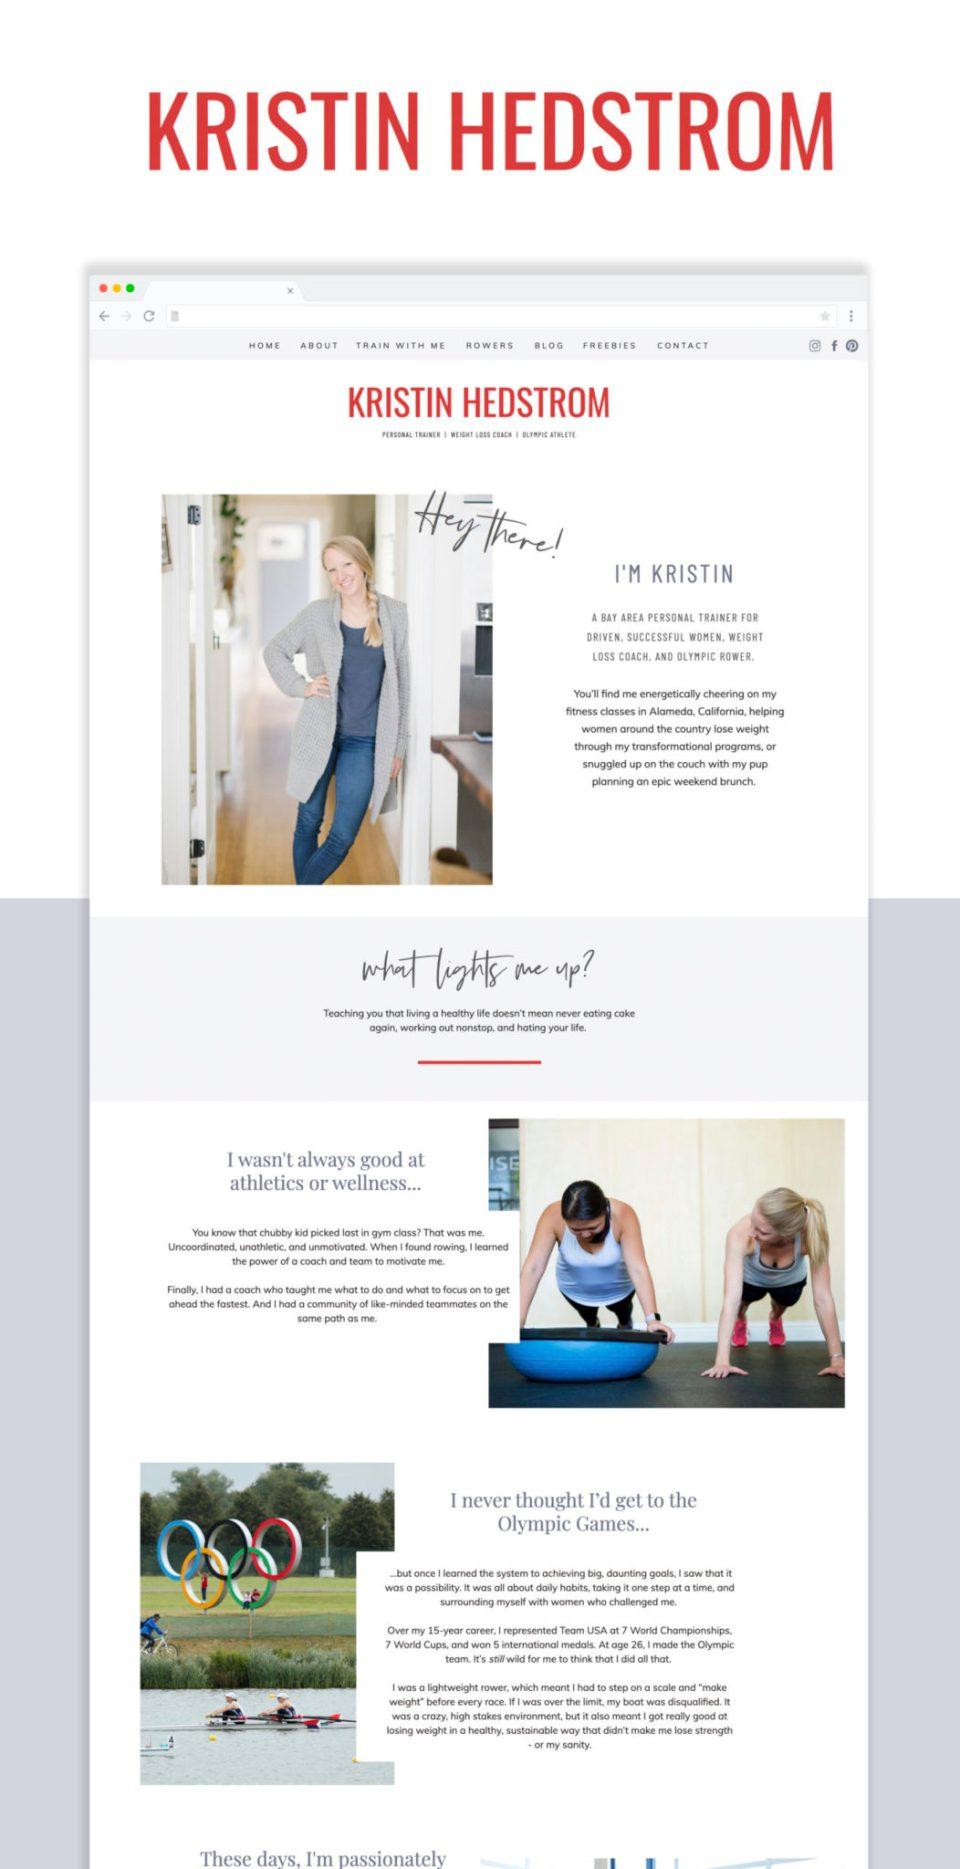 Kristin-Hedstrom-Personal-Trainer-Showit03